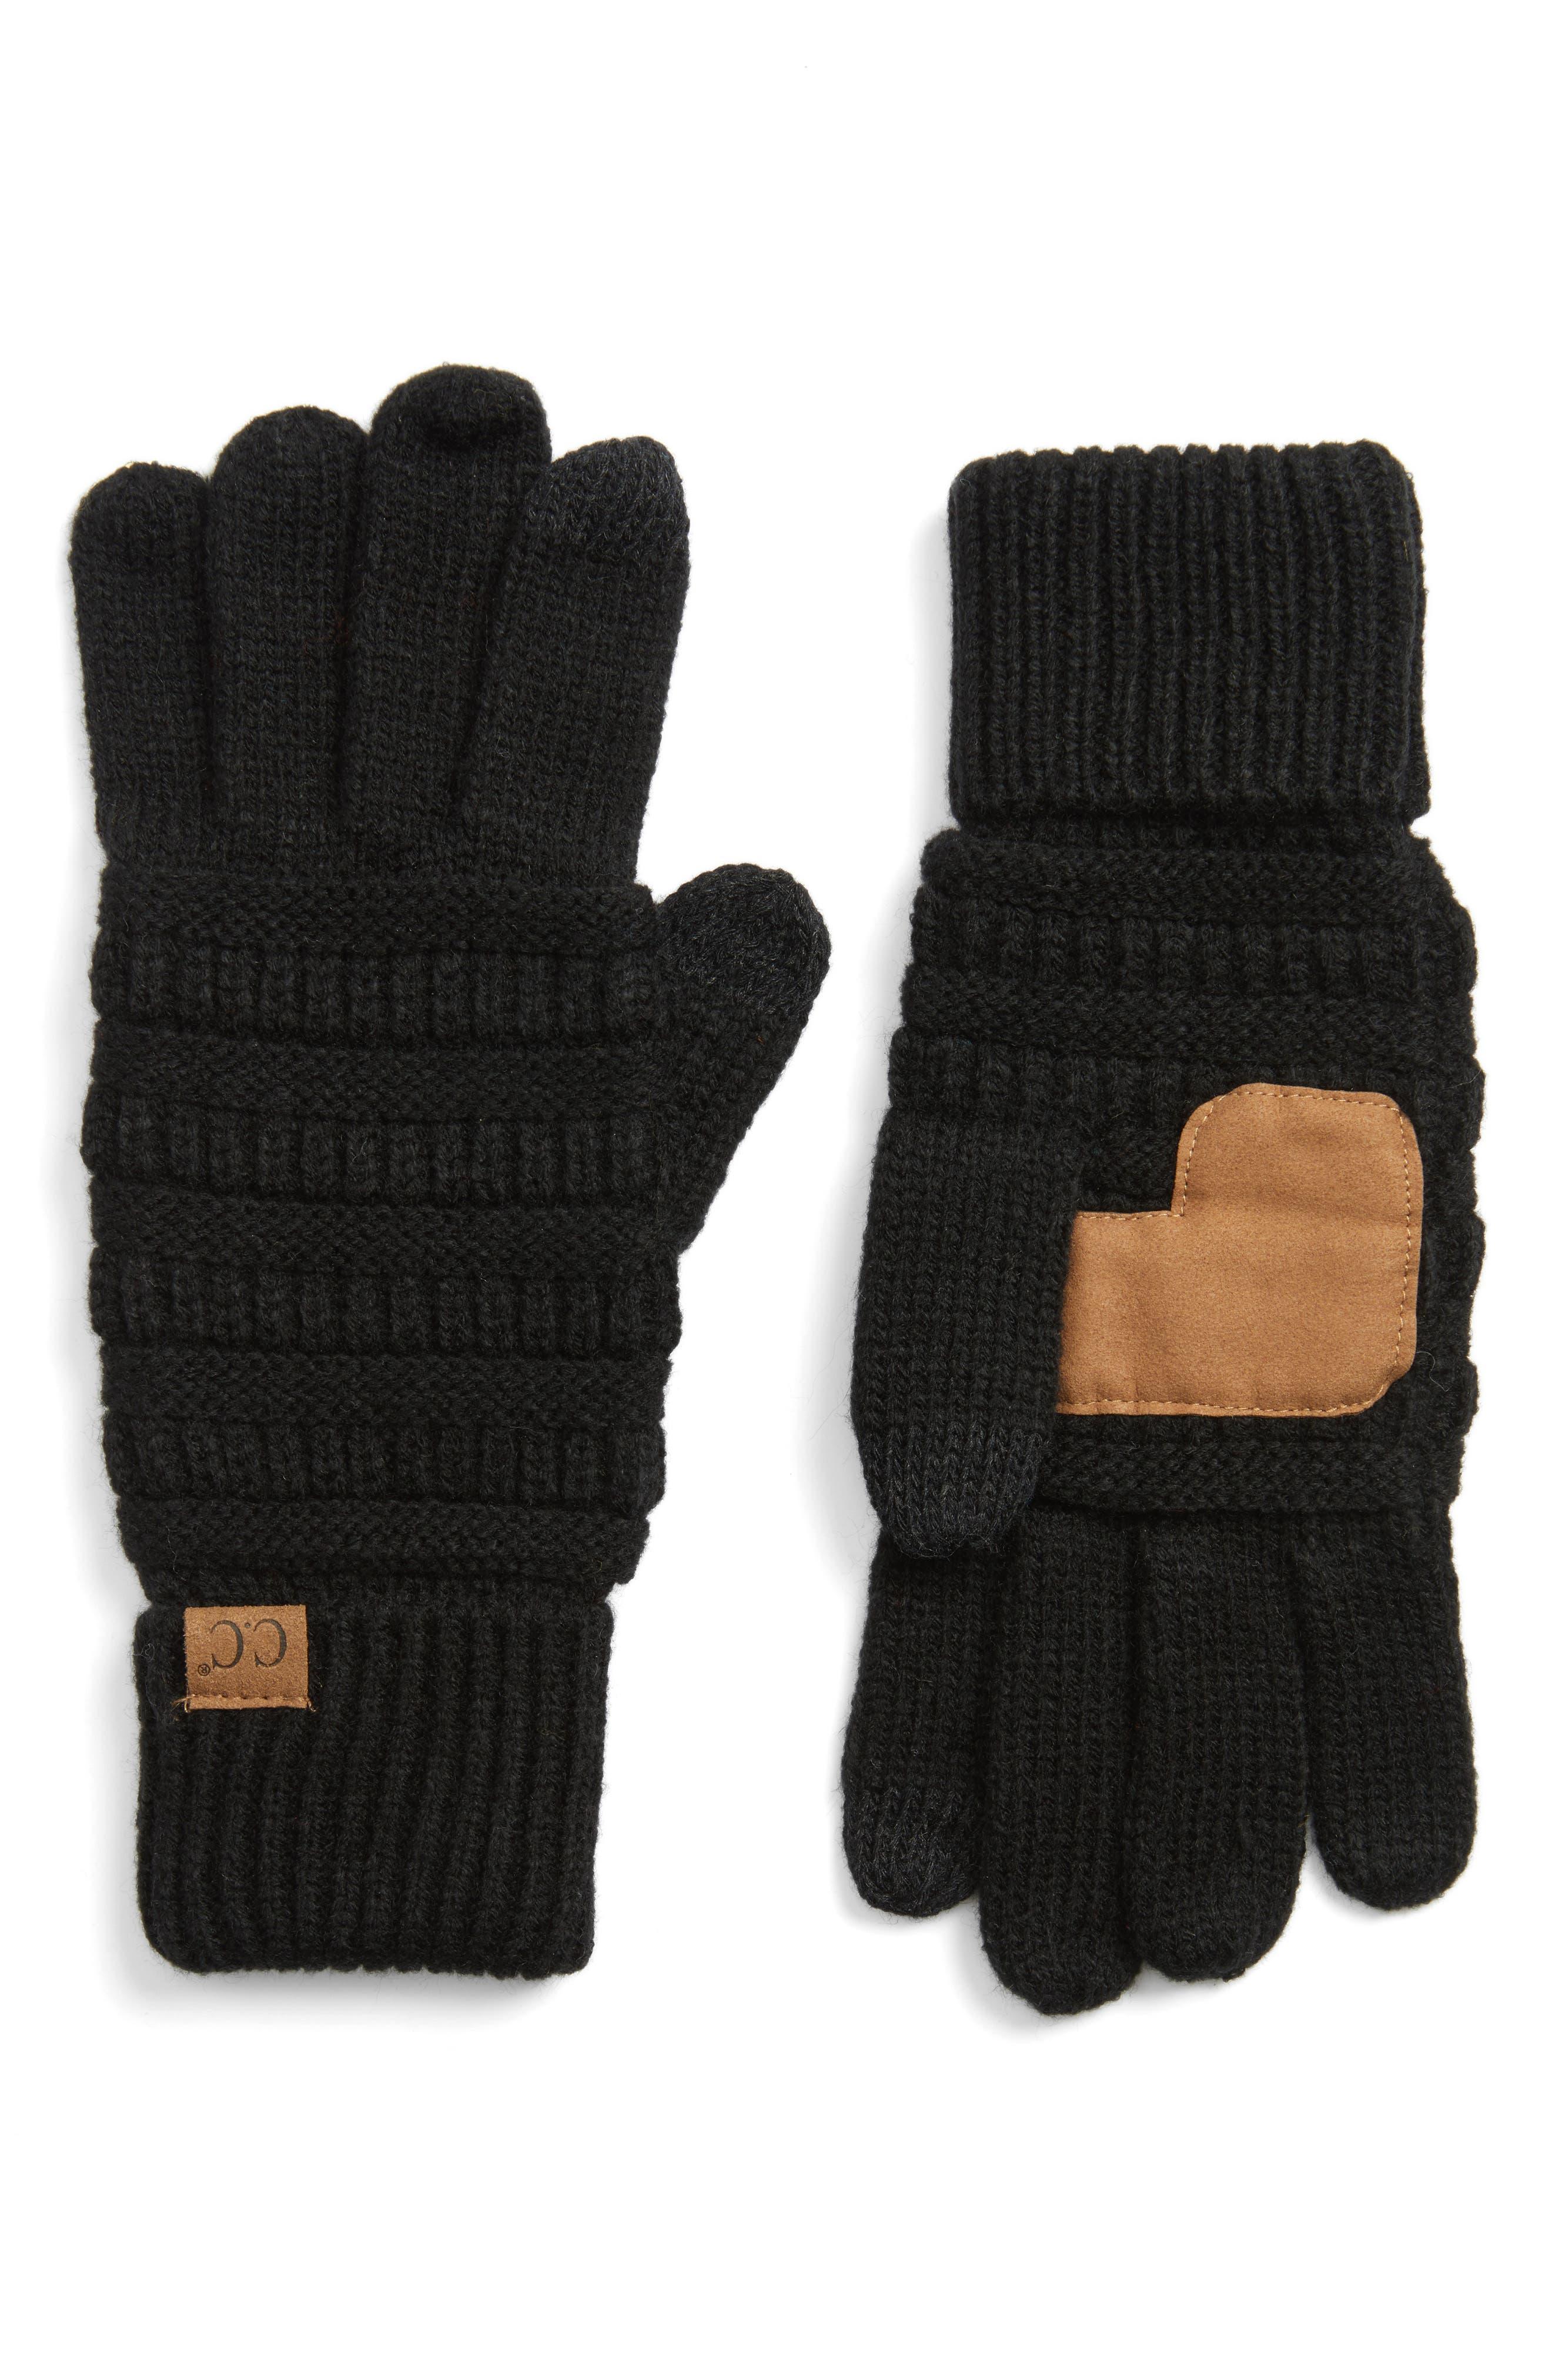 Rib Knit Tech Gloves,                         Main,                         color, Black